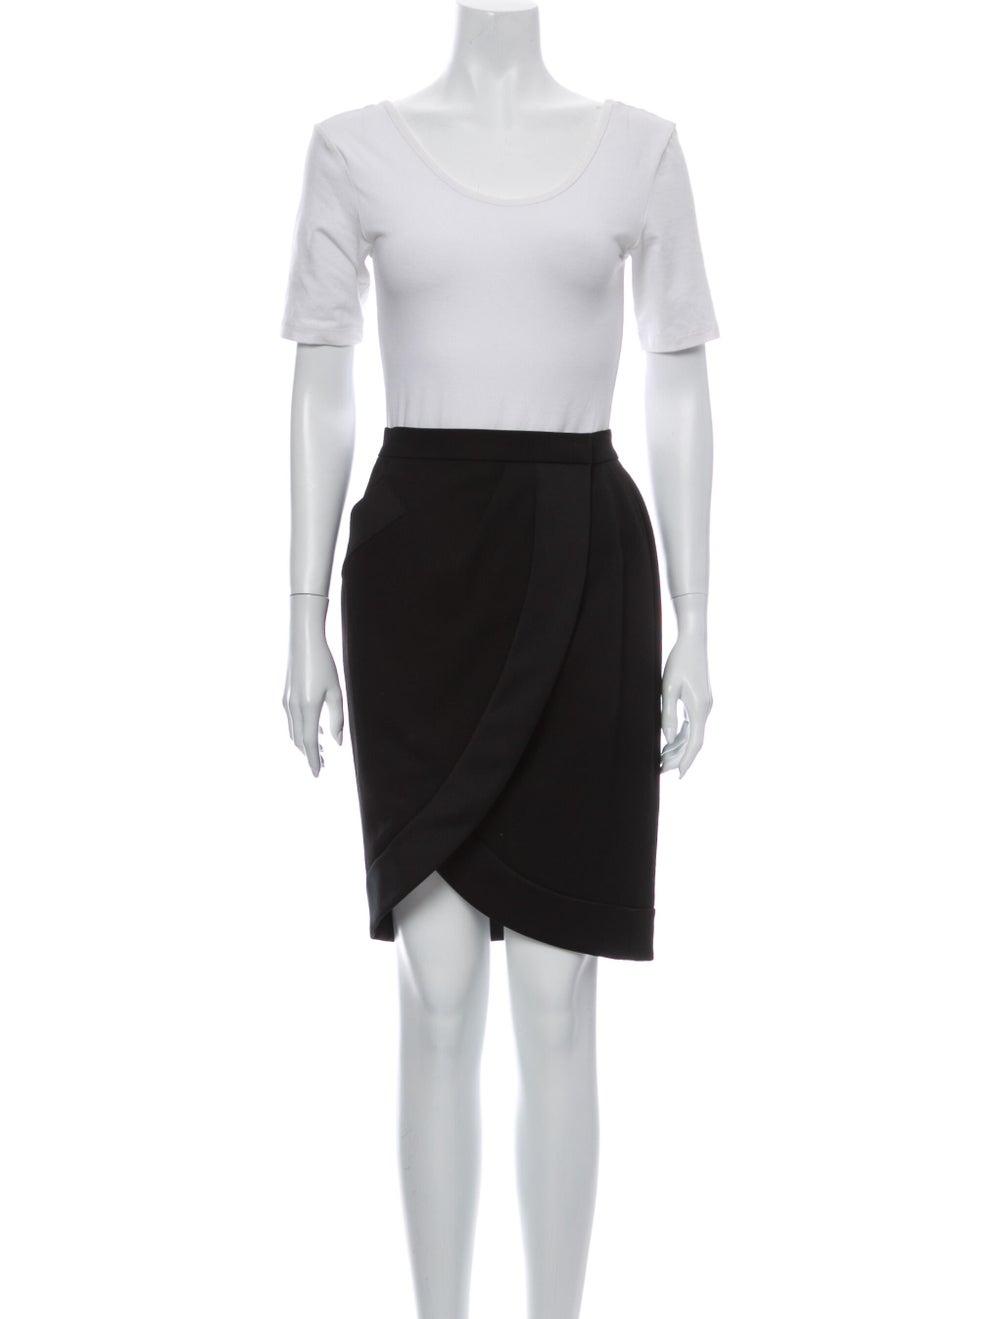 Yves Saint Laurent Vintage Skirt Suit Black - image 4